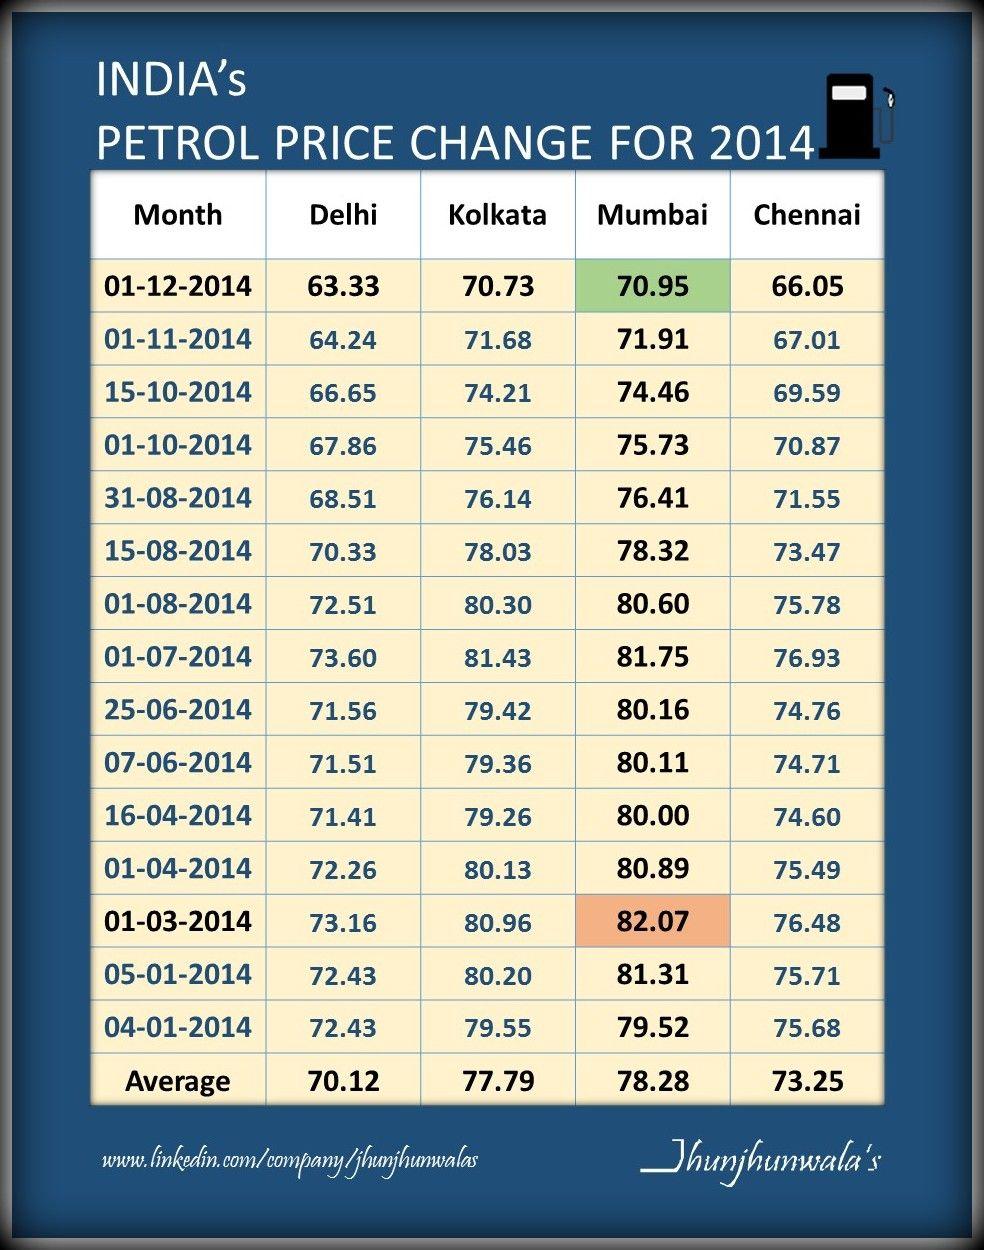 India's FuelPrices Update for Petrol Price in Delhi